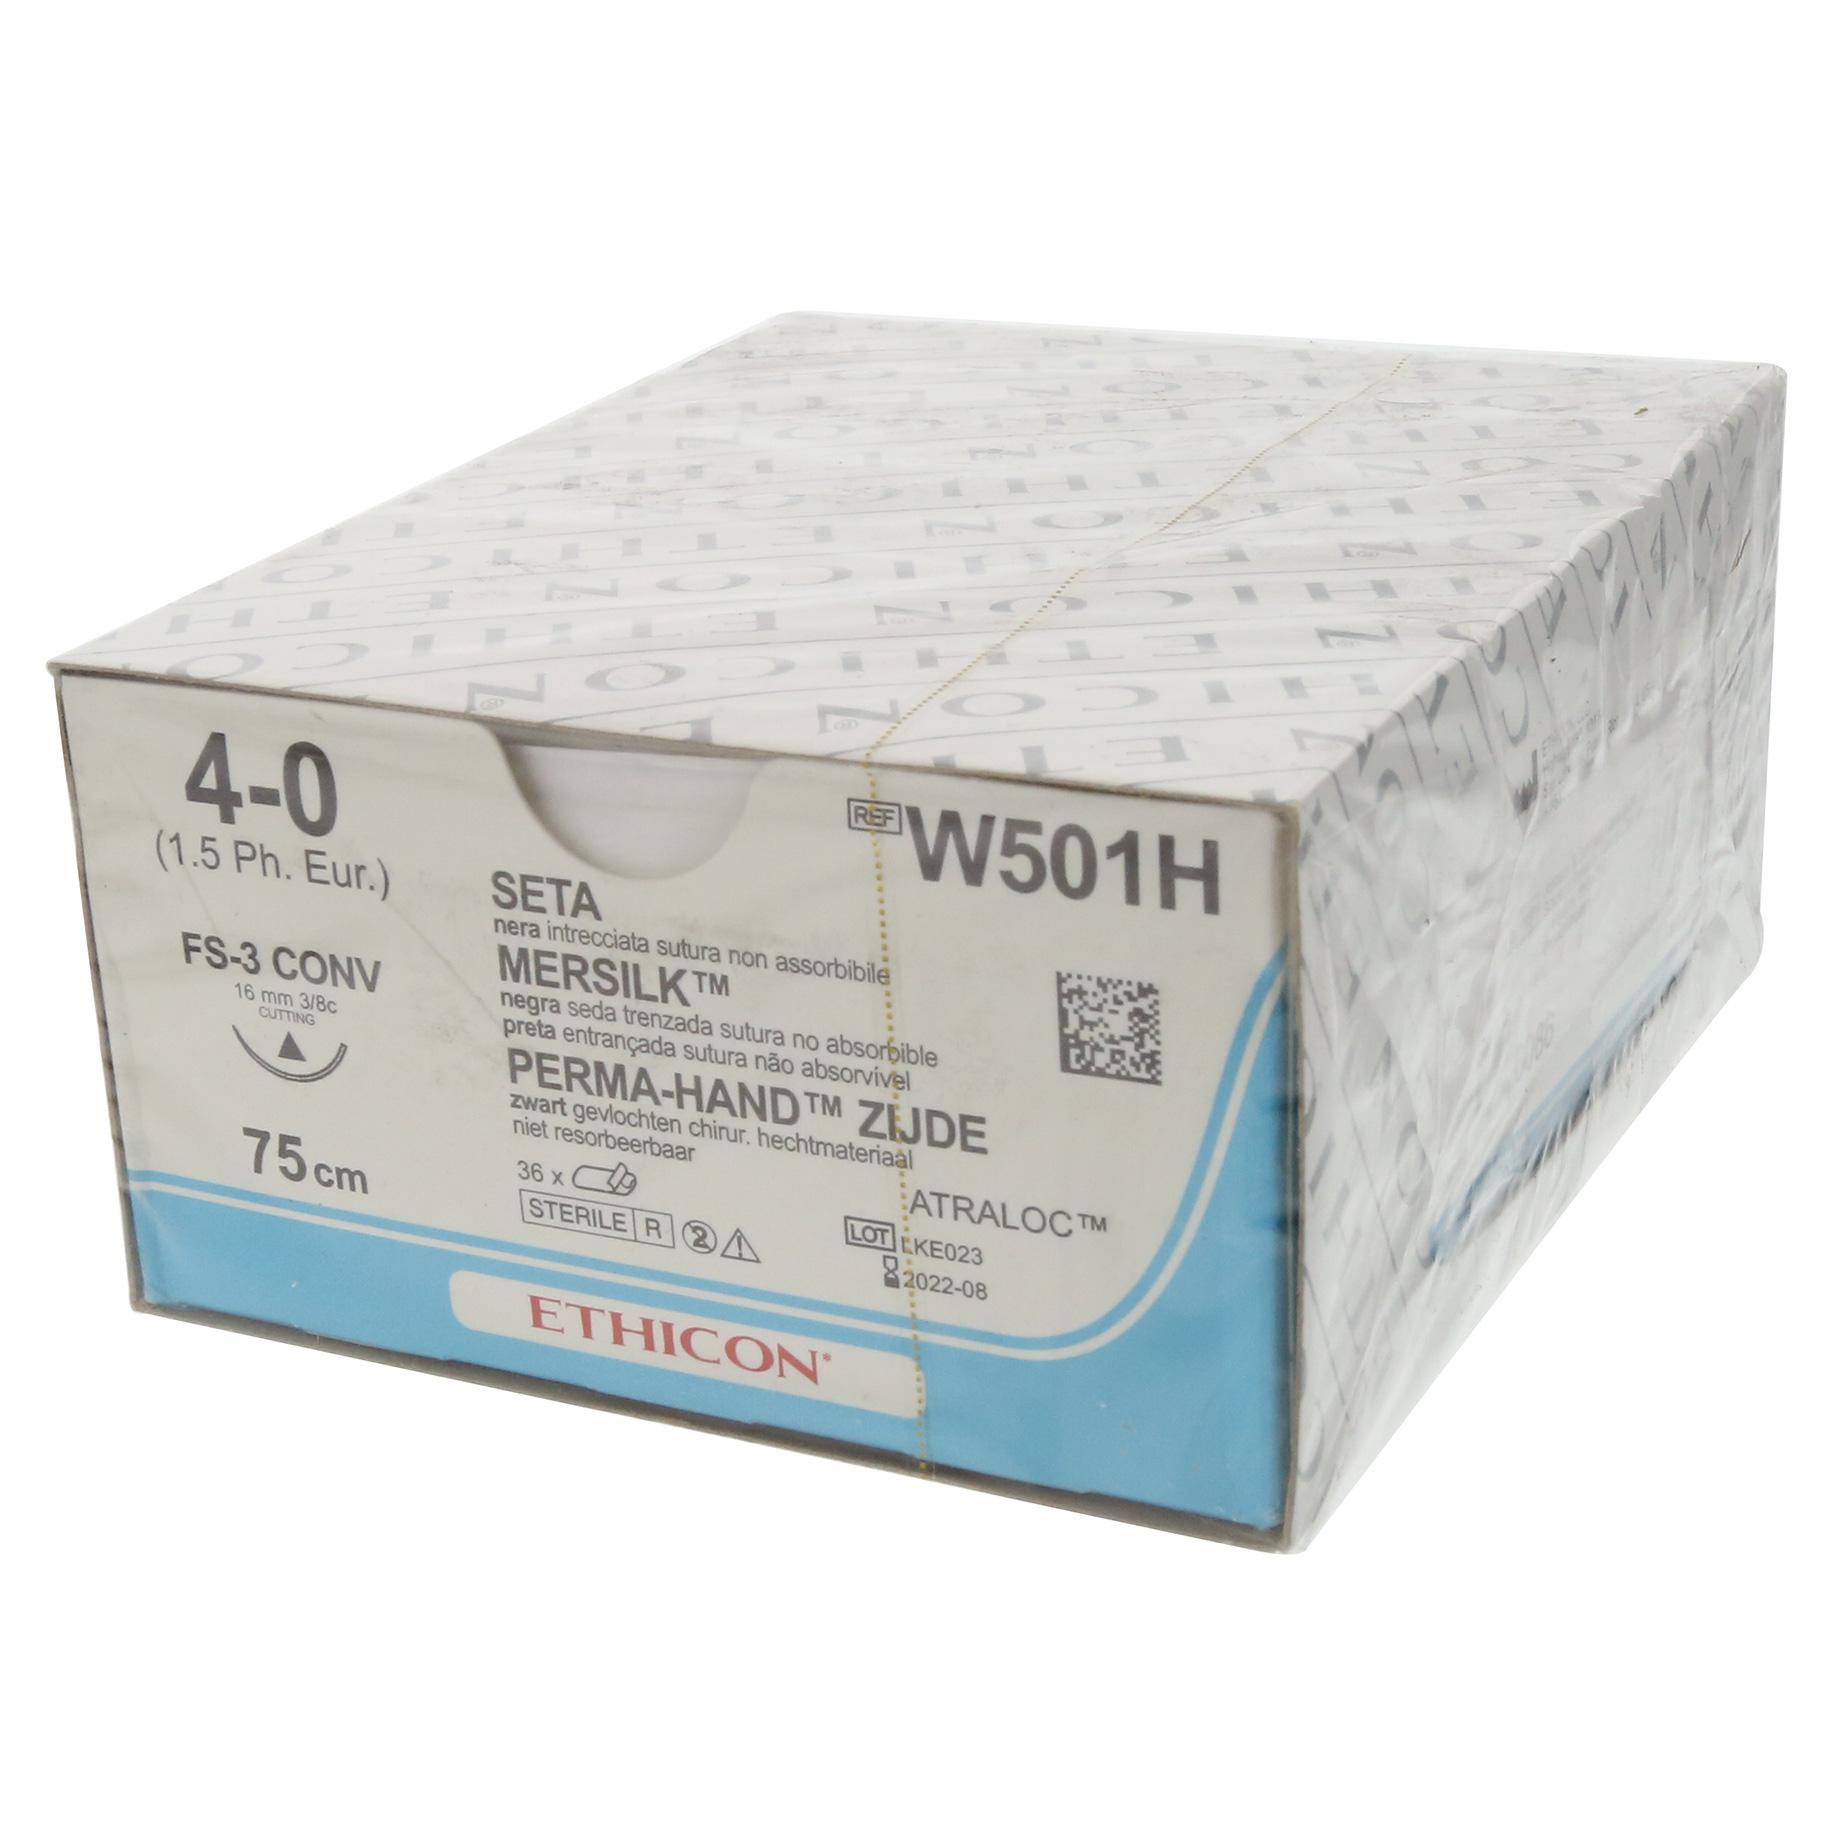 Mersilk Suture W501H 4/0 Gauge Box 36